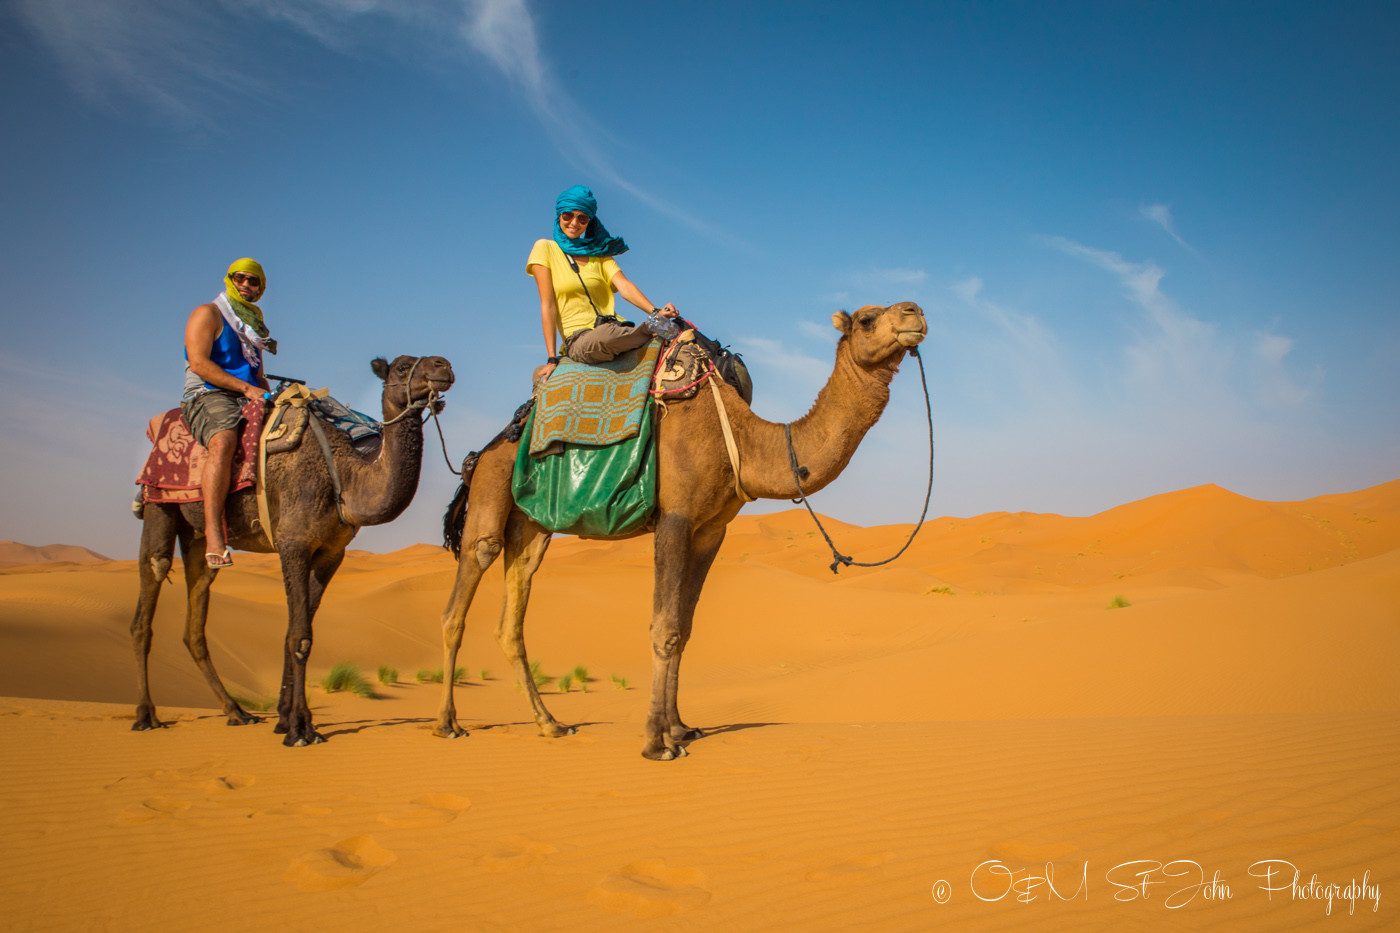 Max and Oksana in Erg Chebbi, Sahara Desert. Morocco, off the grid vacation